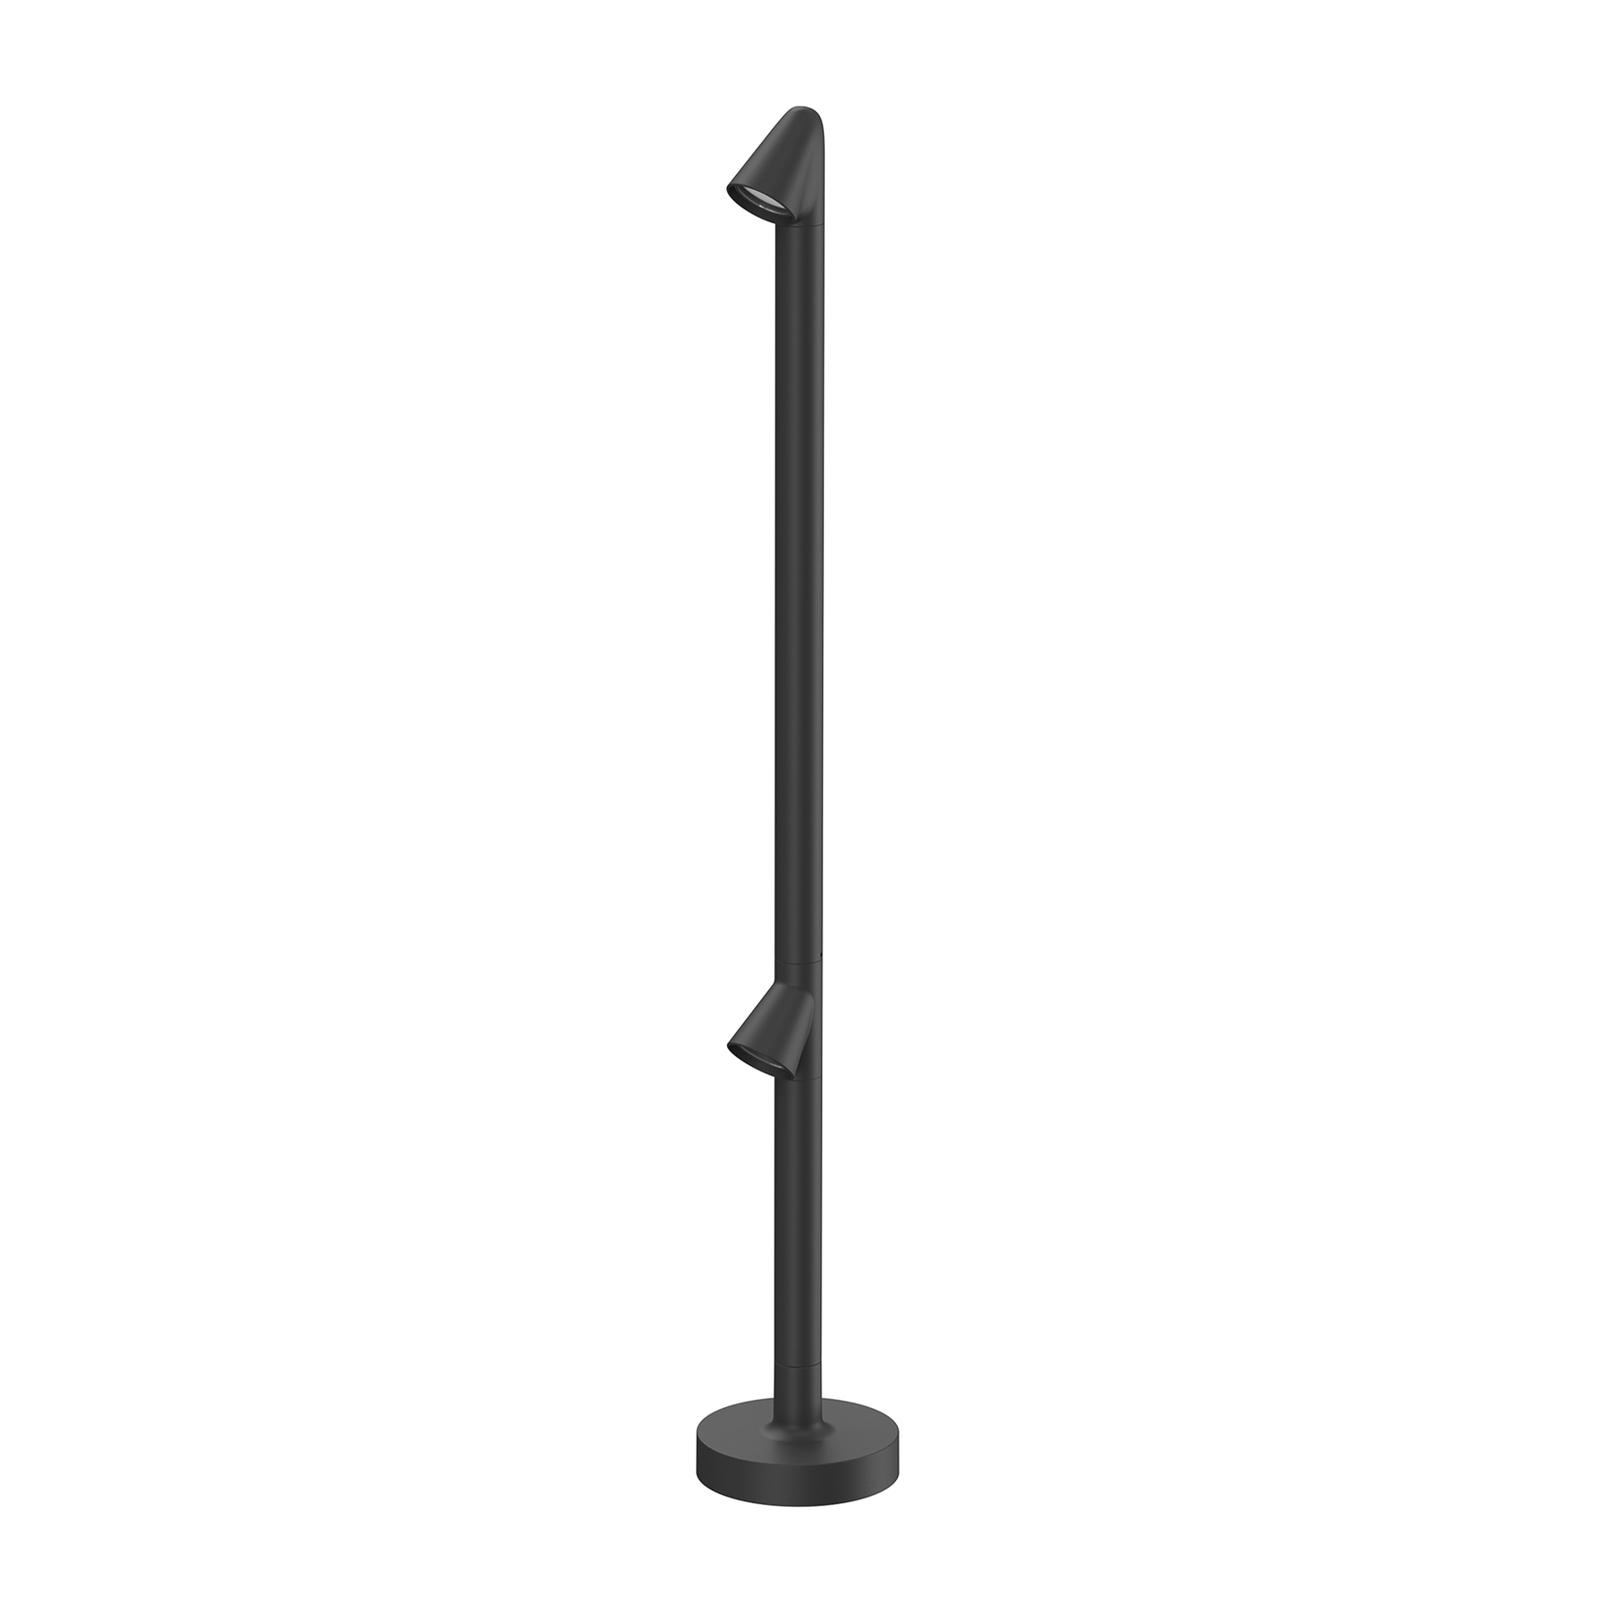 FLOS Walkstick 2 Double gånglampa 2700K svart